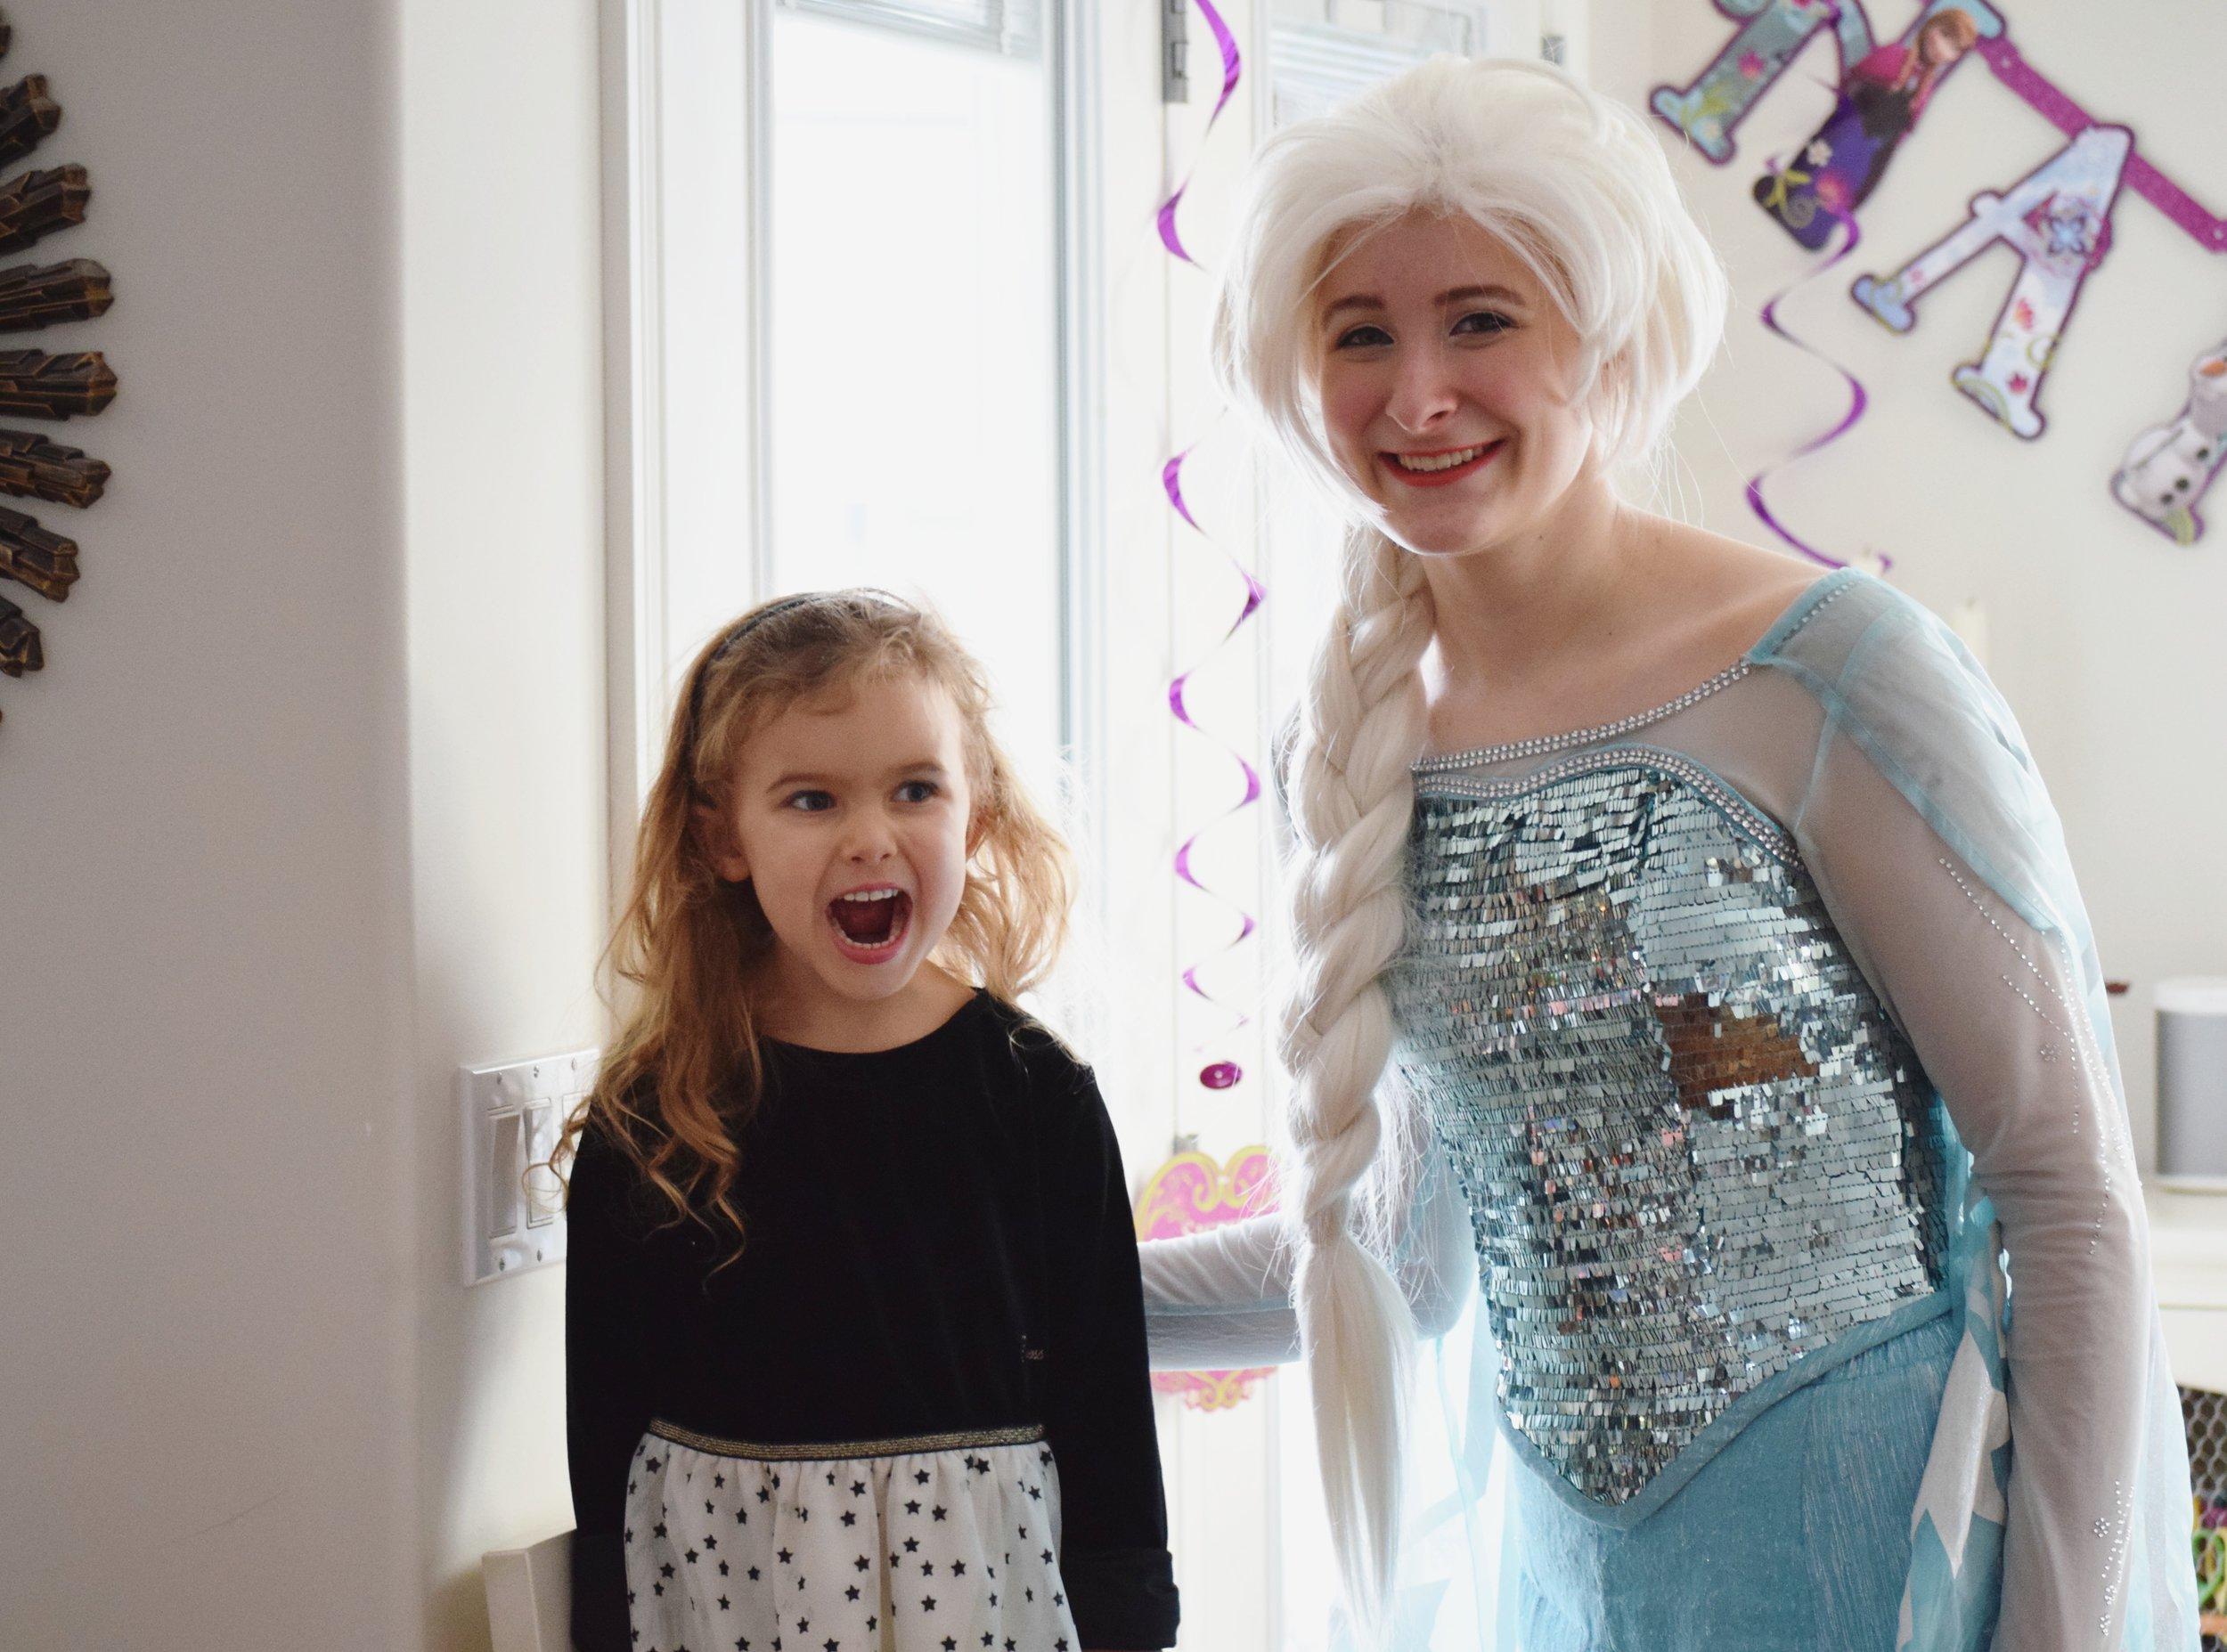 frozen birthday party with princess elsa saskatoon2.jpg